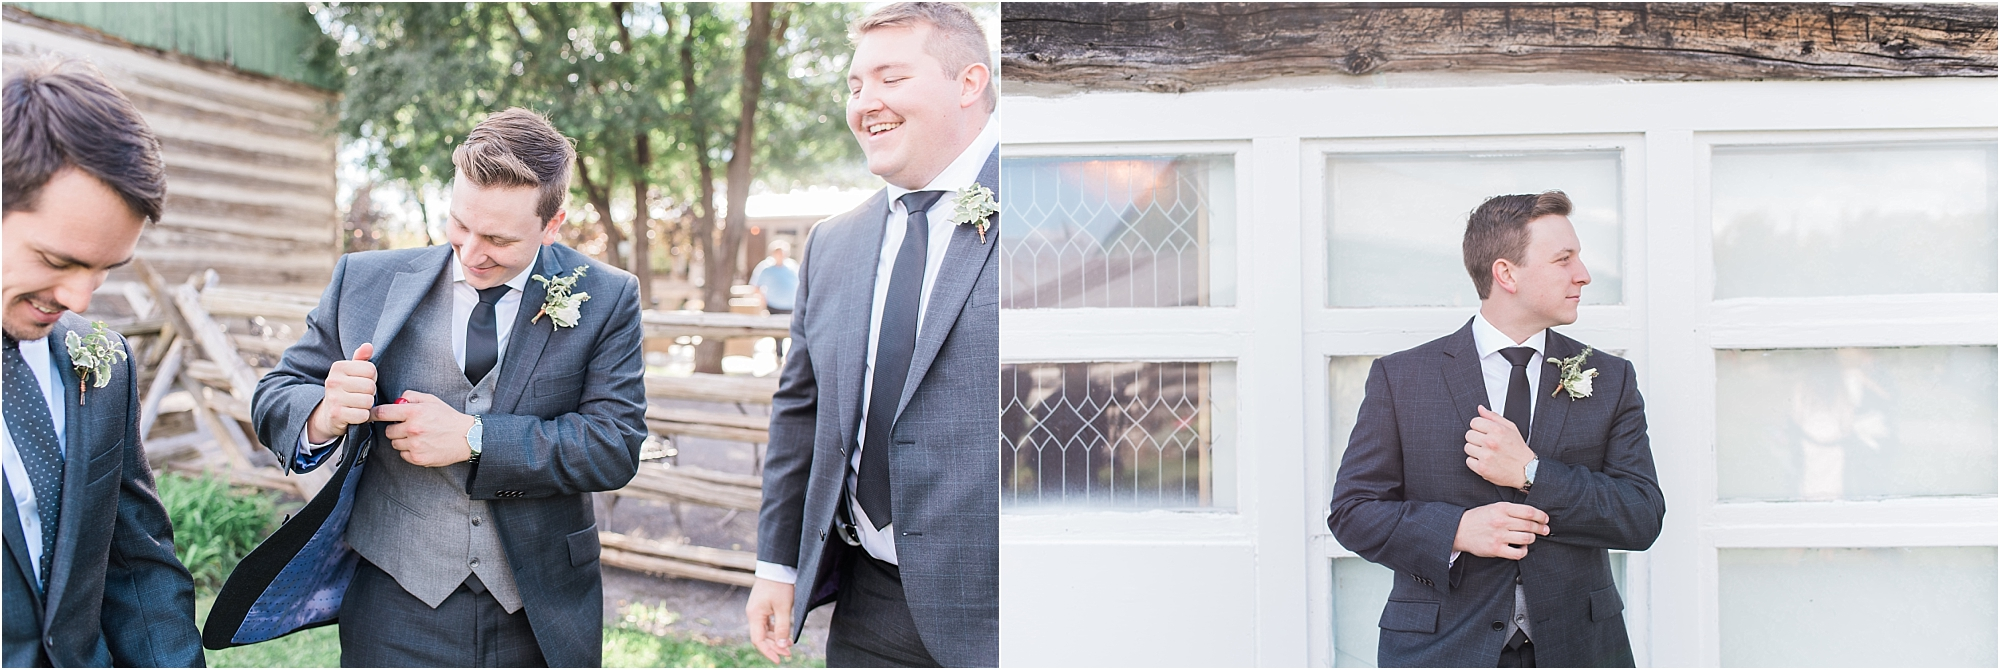 0053 Summer Stonefields Wedding Carleton Place - Ottawa Wedding - Photography by Emma_WEB.jpg